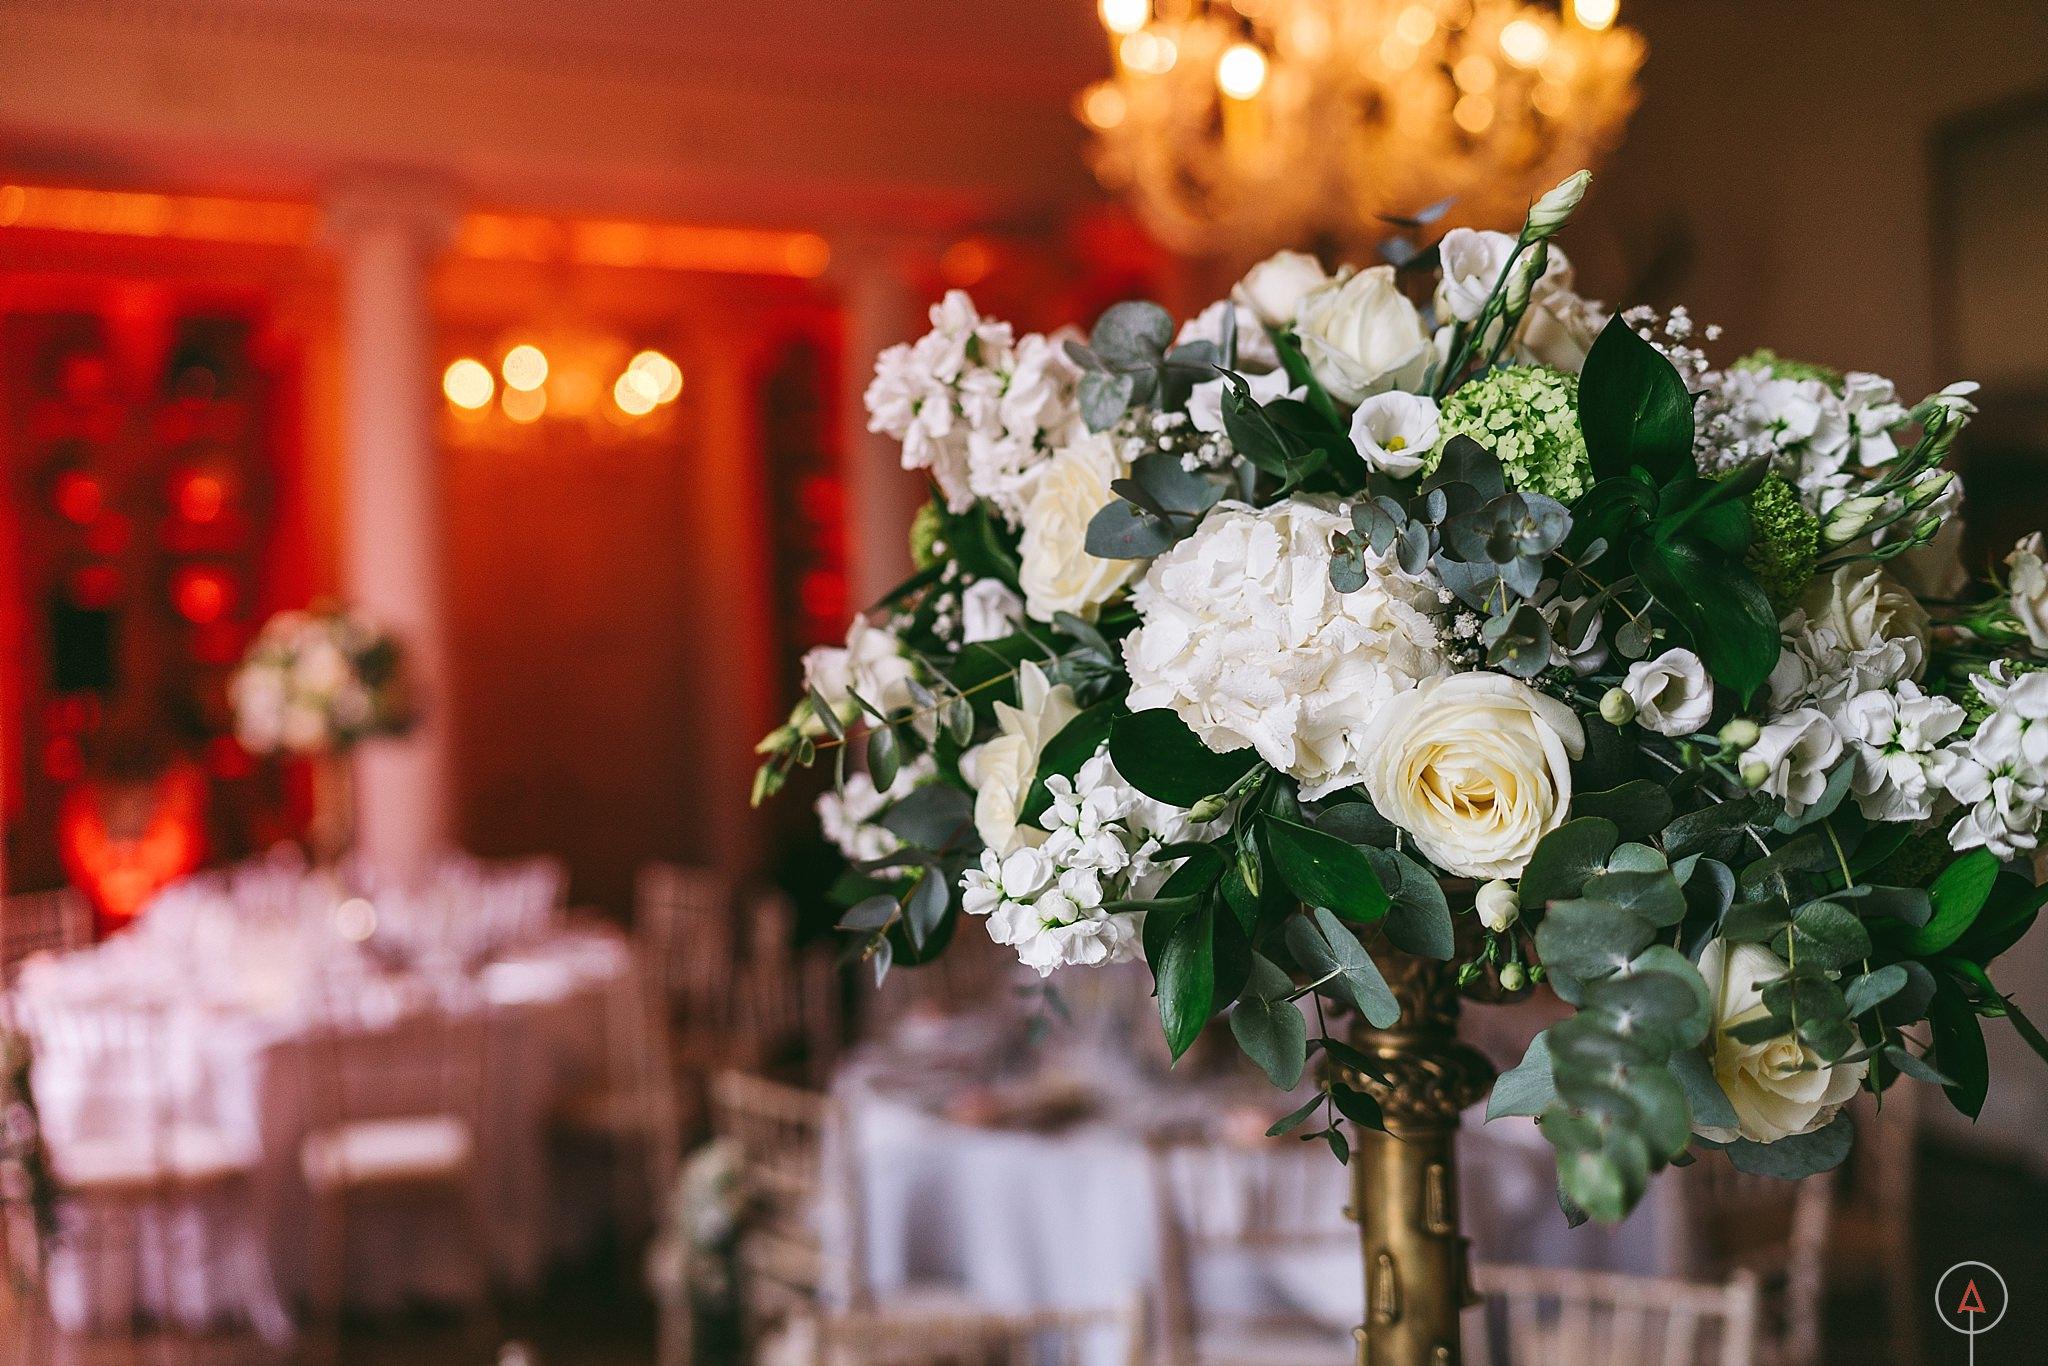 cardiff-wedding-photographer-aga-tomaszek_0291